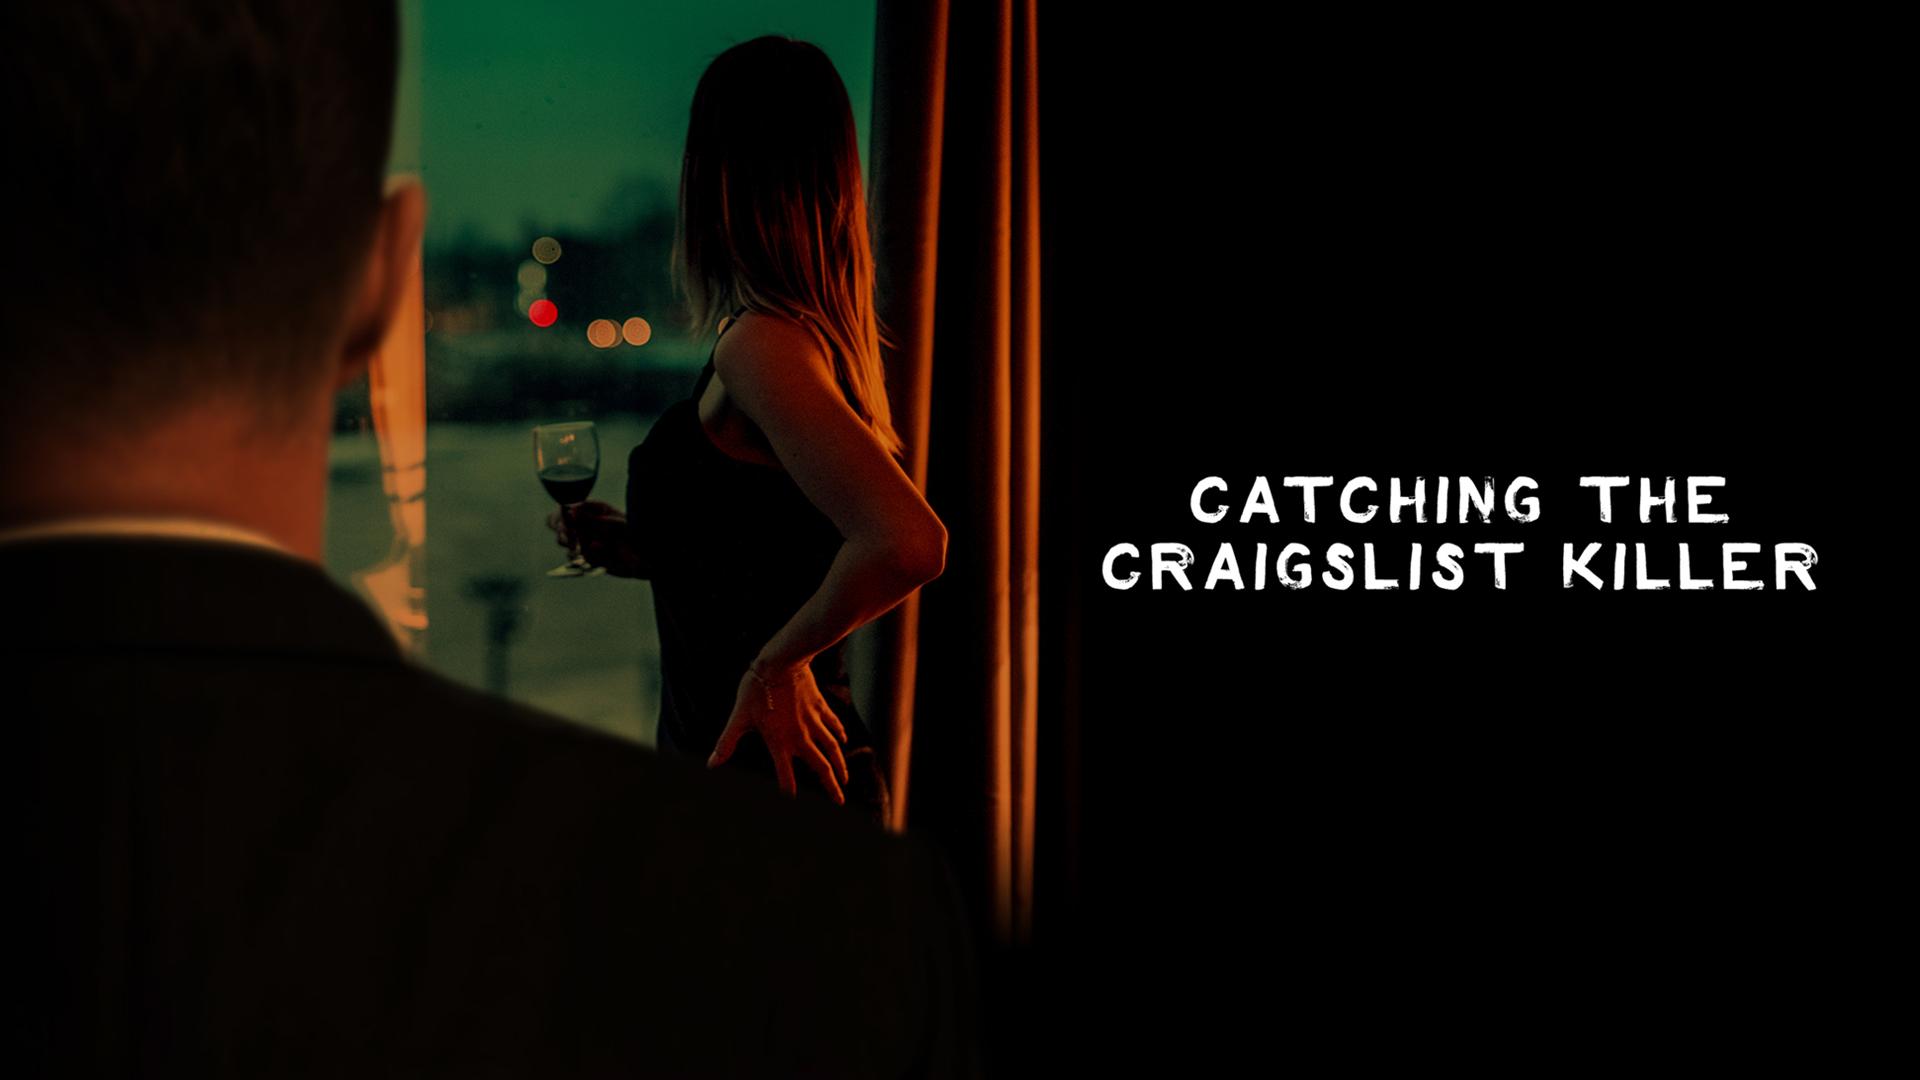 Catching the Craigslist Killer HD